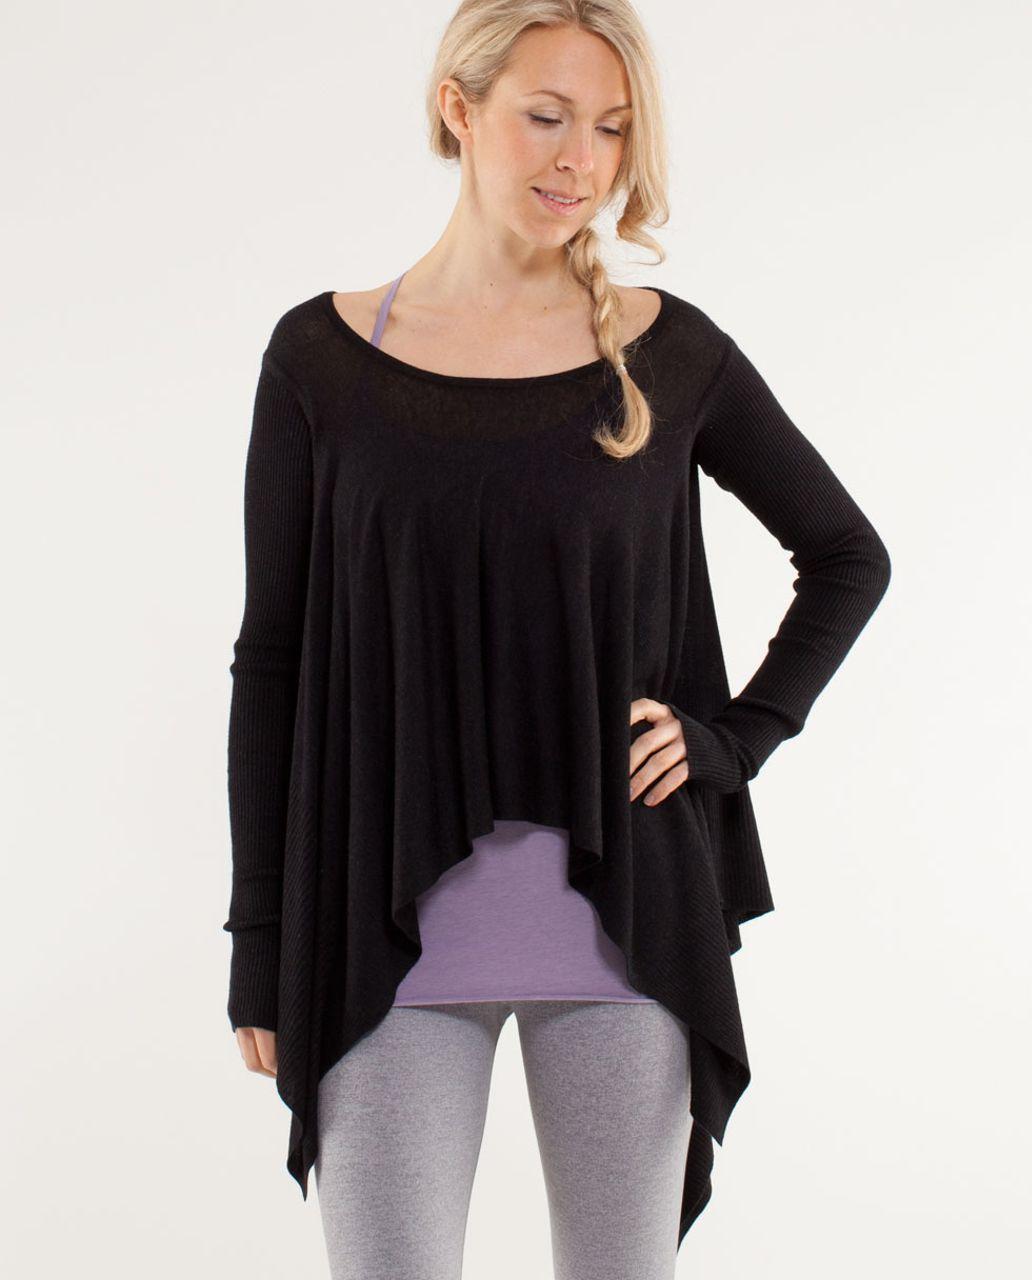 Lululemon Enlightened Pullover - Heathered Black